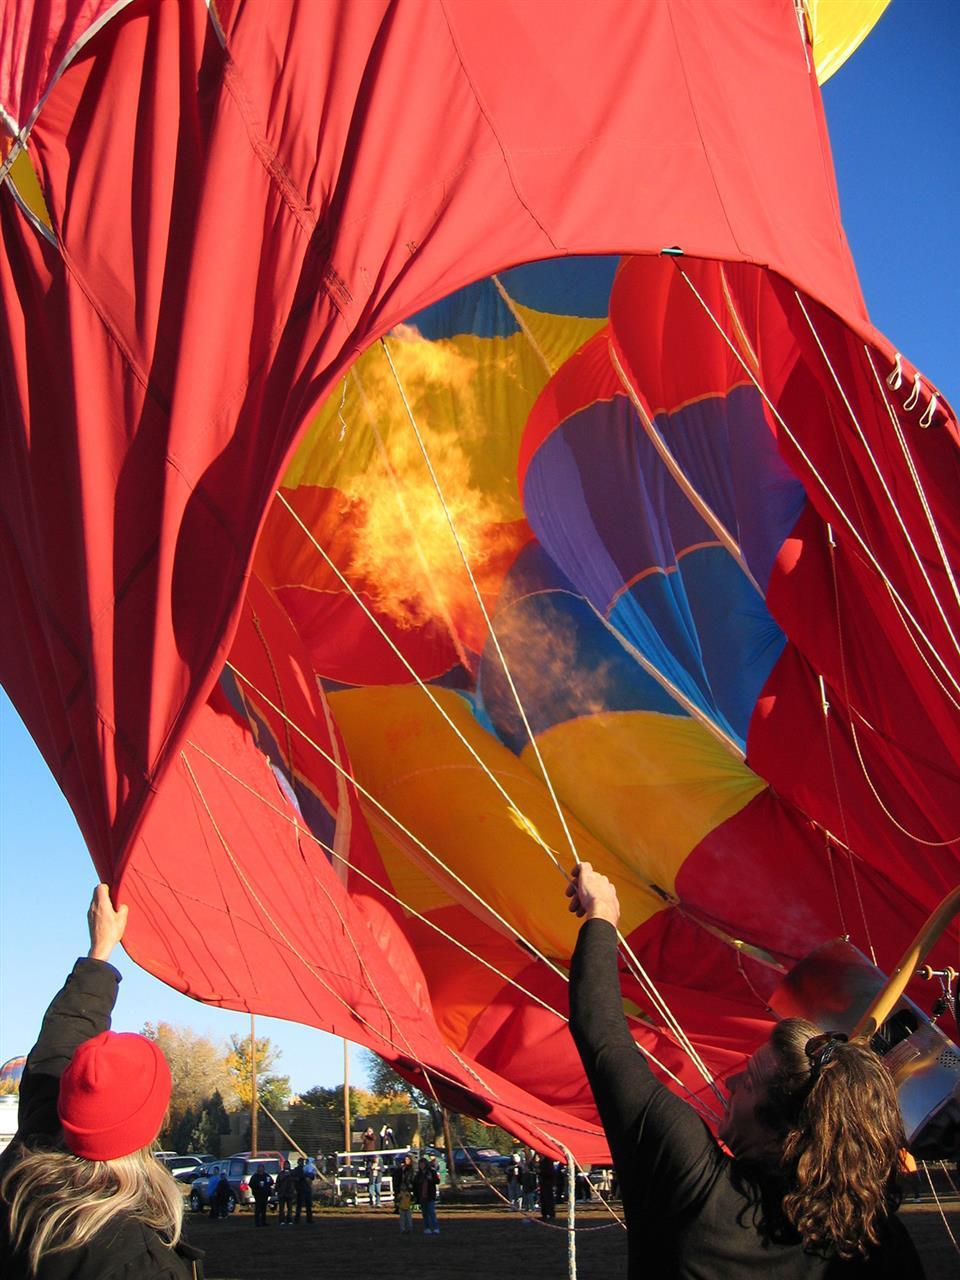 #Taos recreation #Balloon Festival #Taos #New Mexio